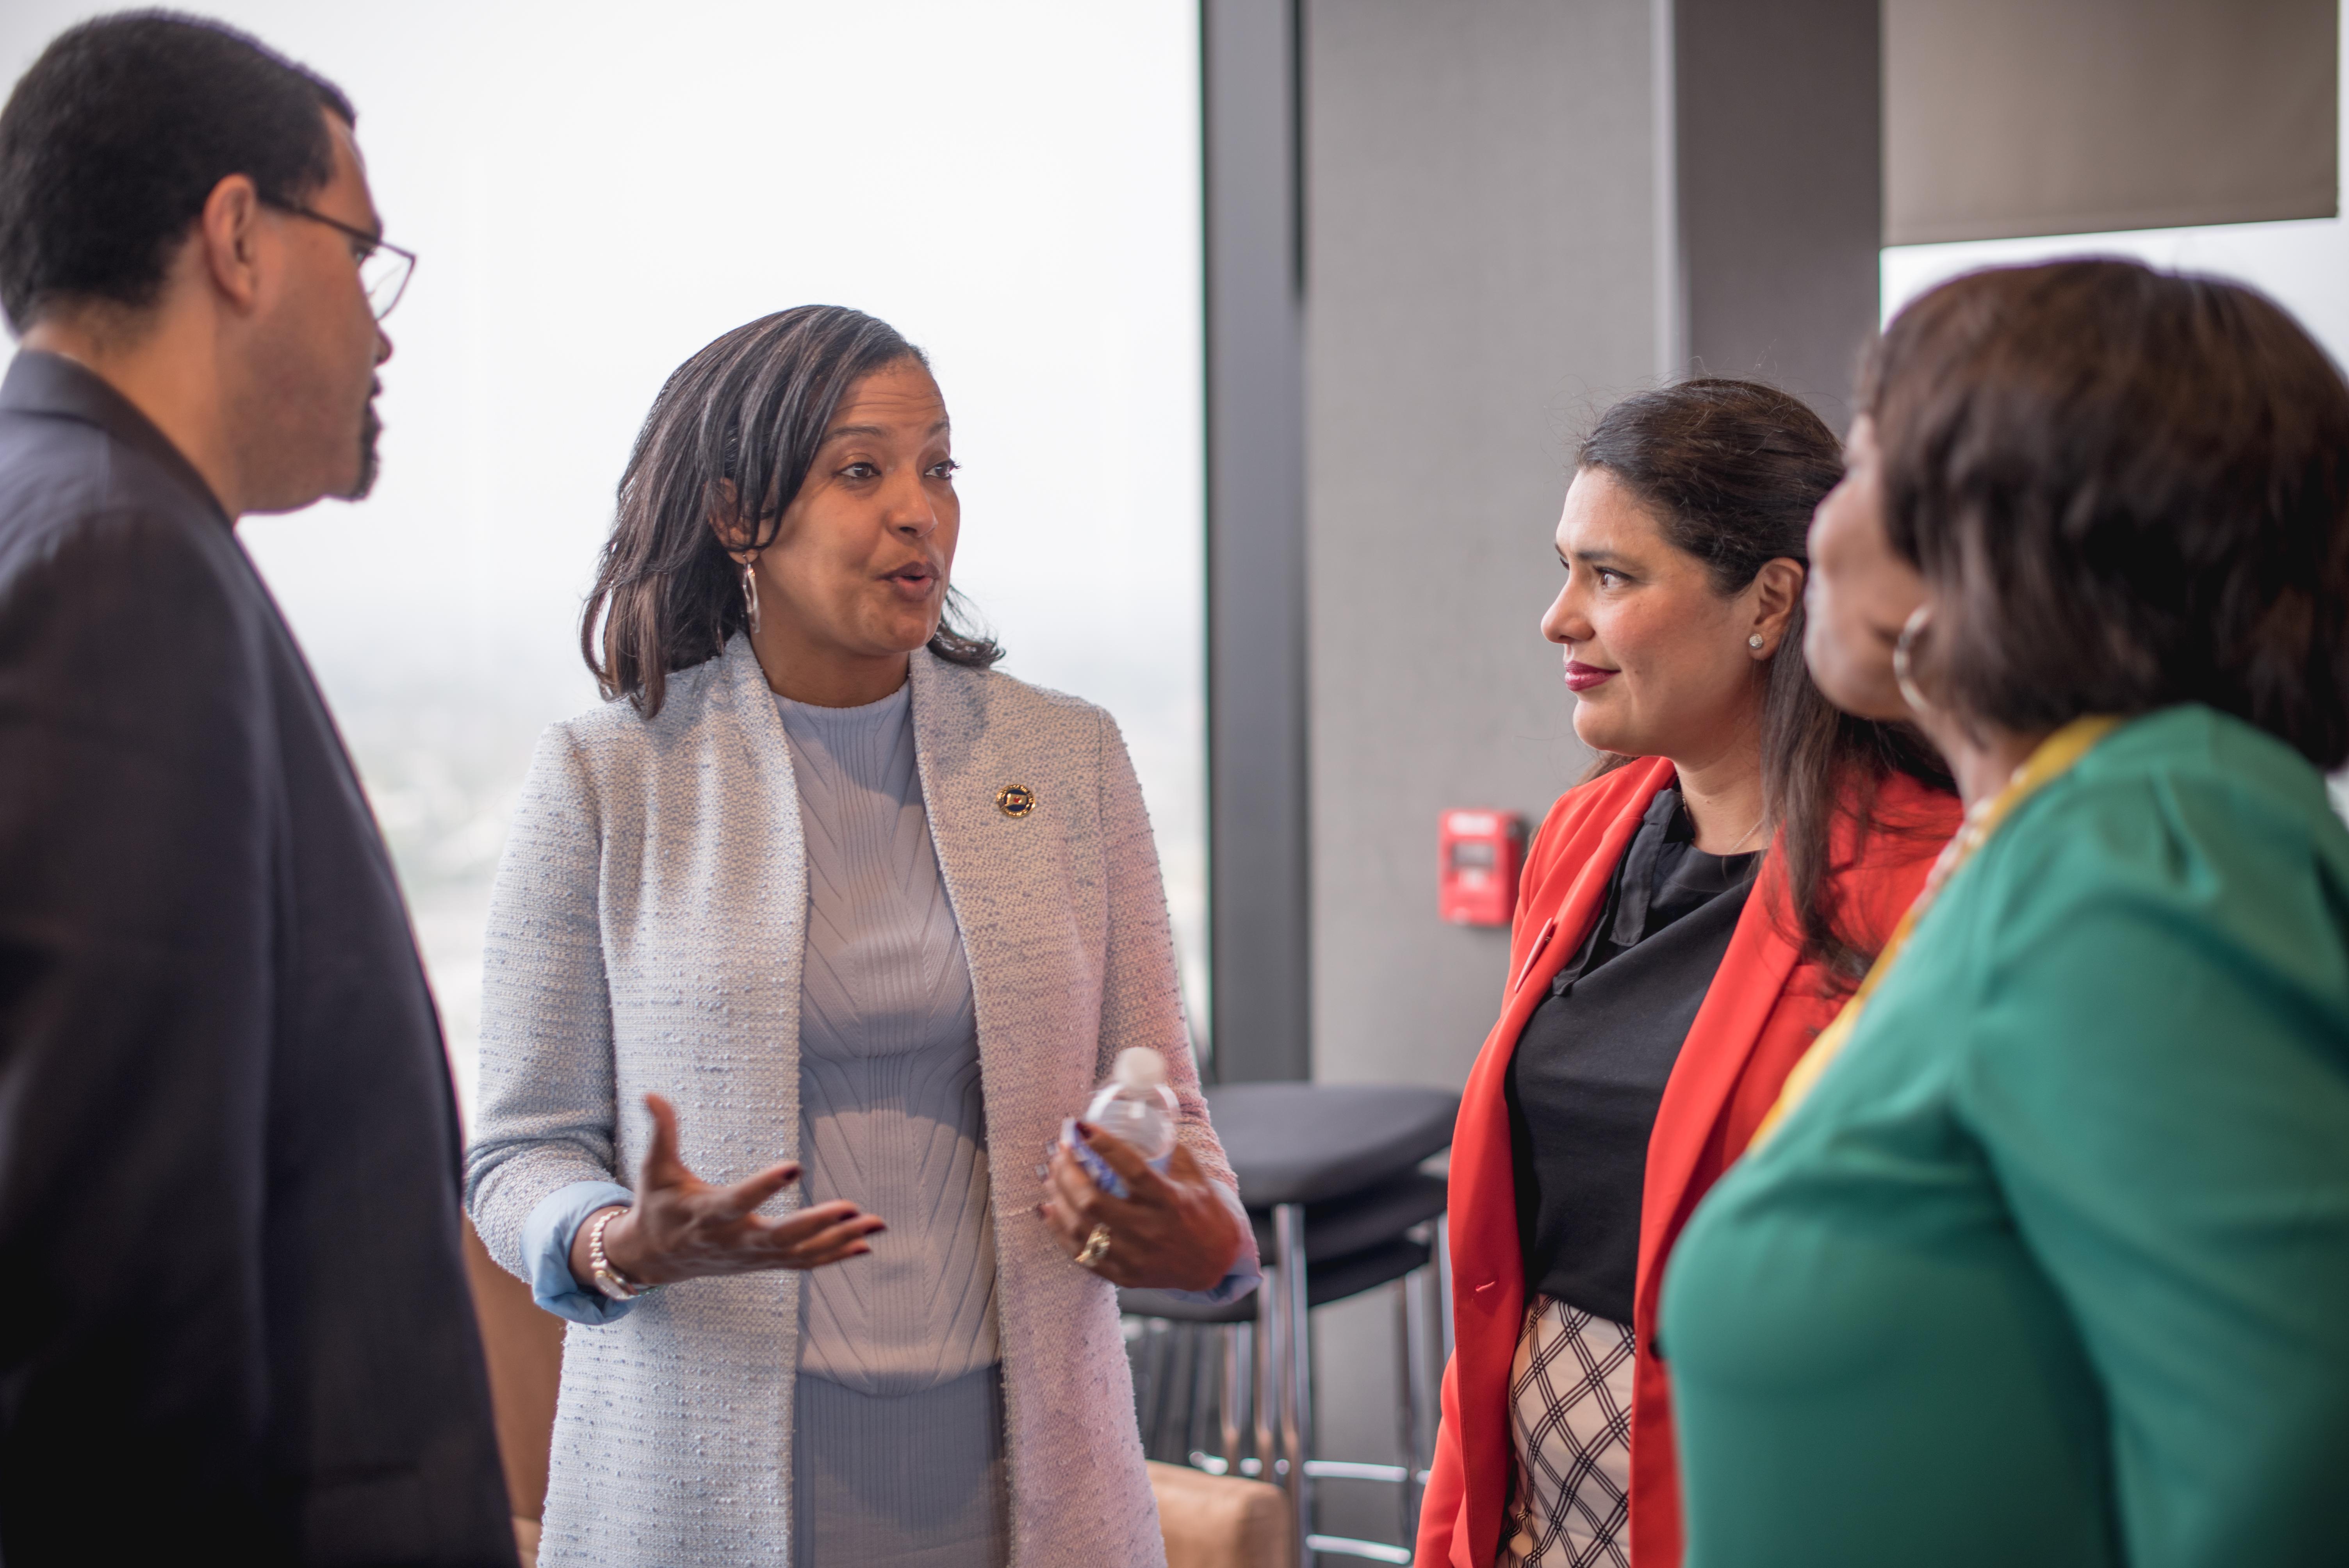 Former U.S. Secretary of Education John King, Congresswoman Jahana Hayes, Secretary-Treasurer of the Texas AFL-CIO Montserrat Garibay, and Former Chancellor of DC Public Schools, Kaya Henderson